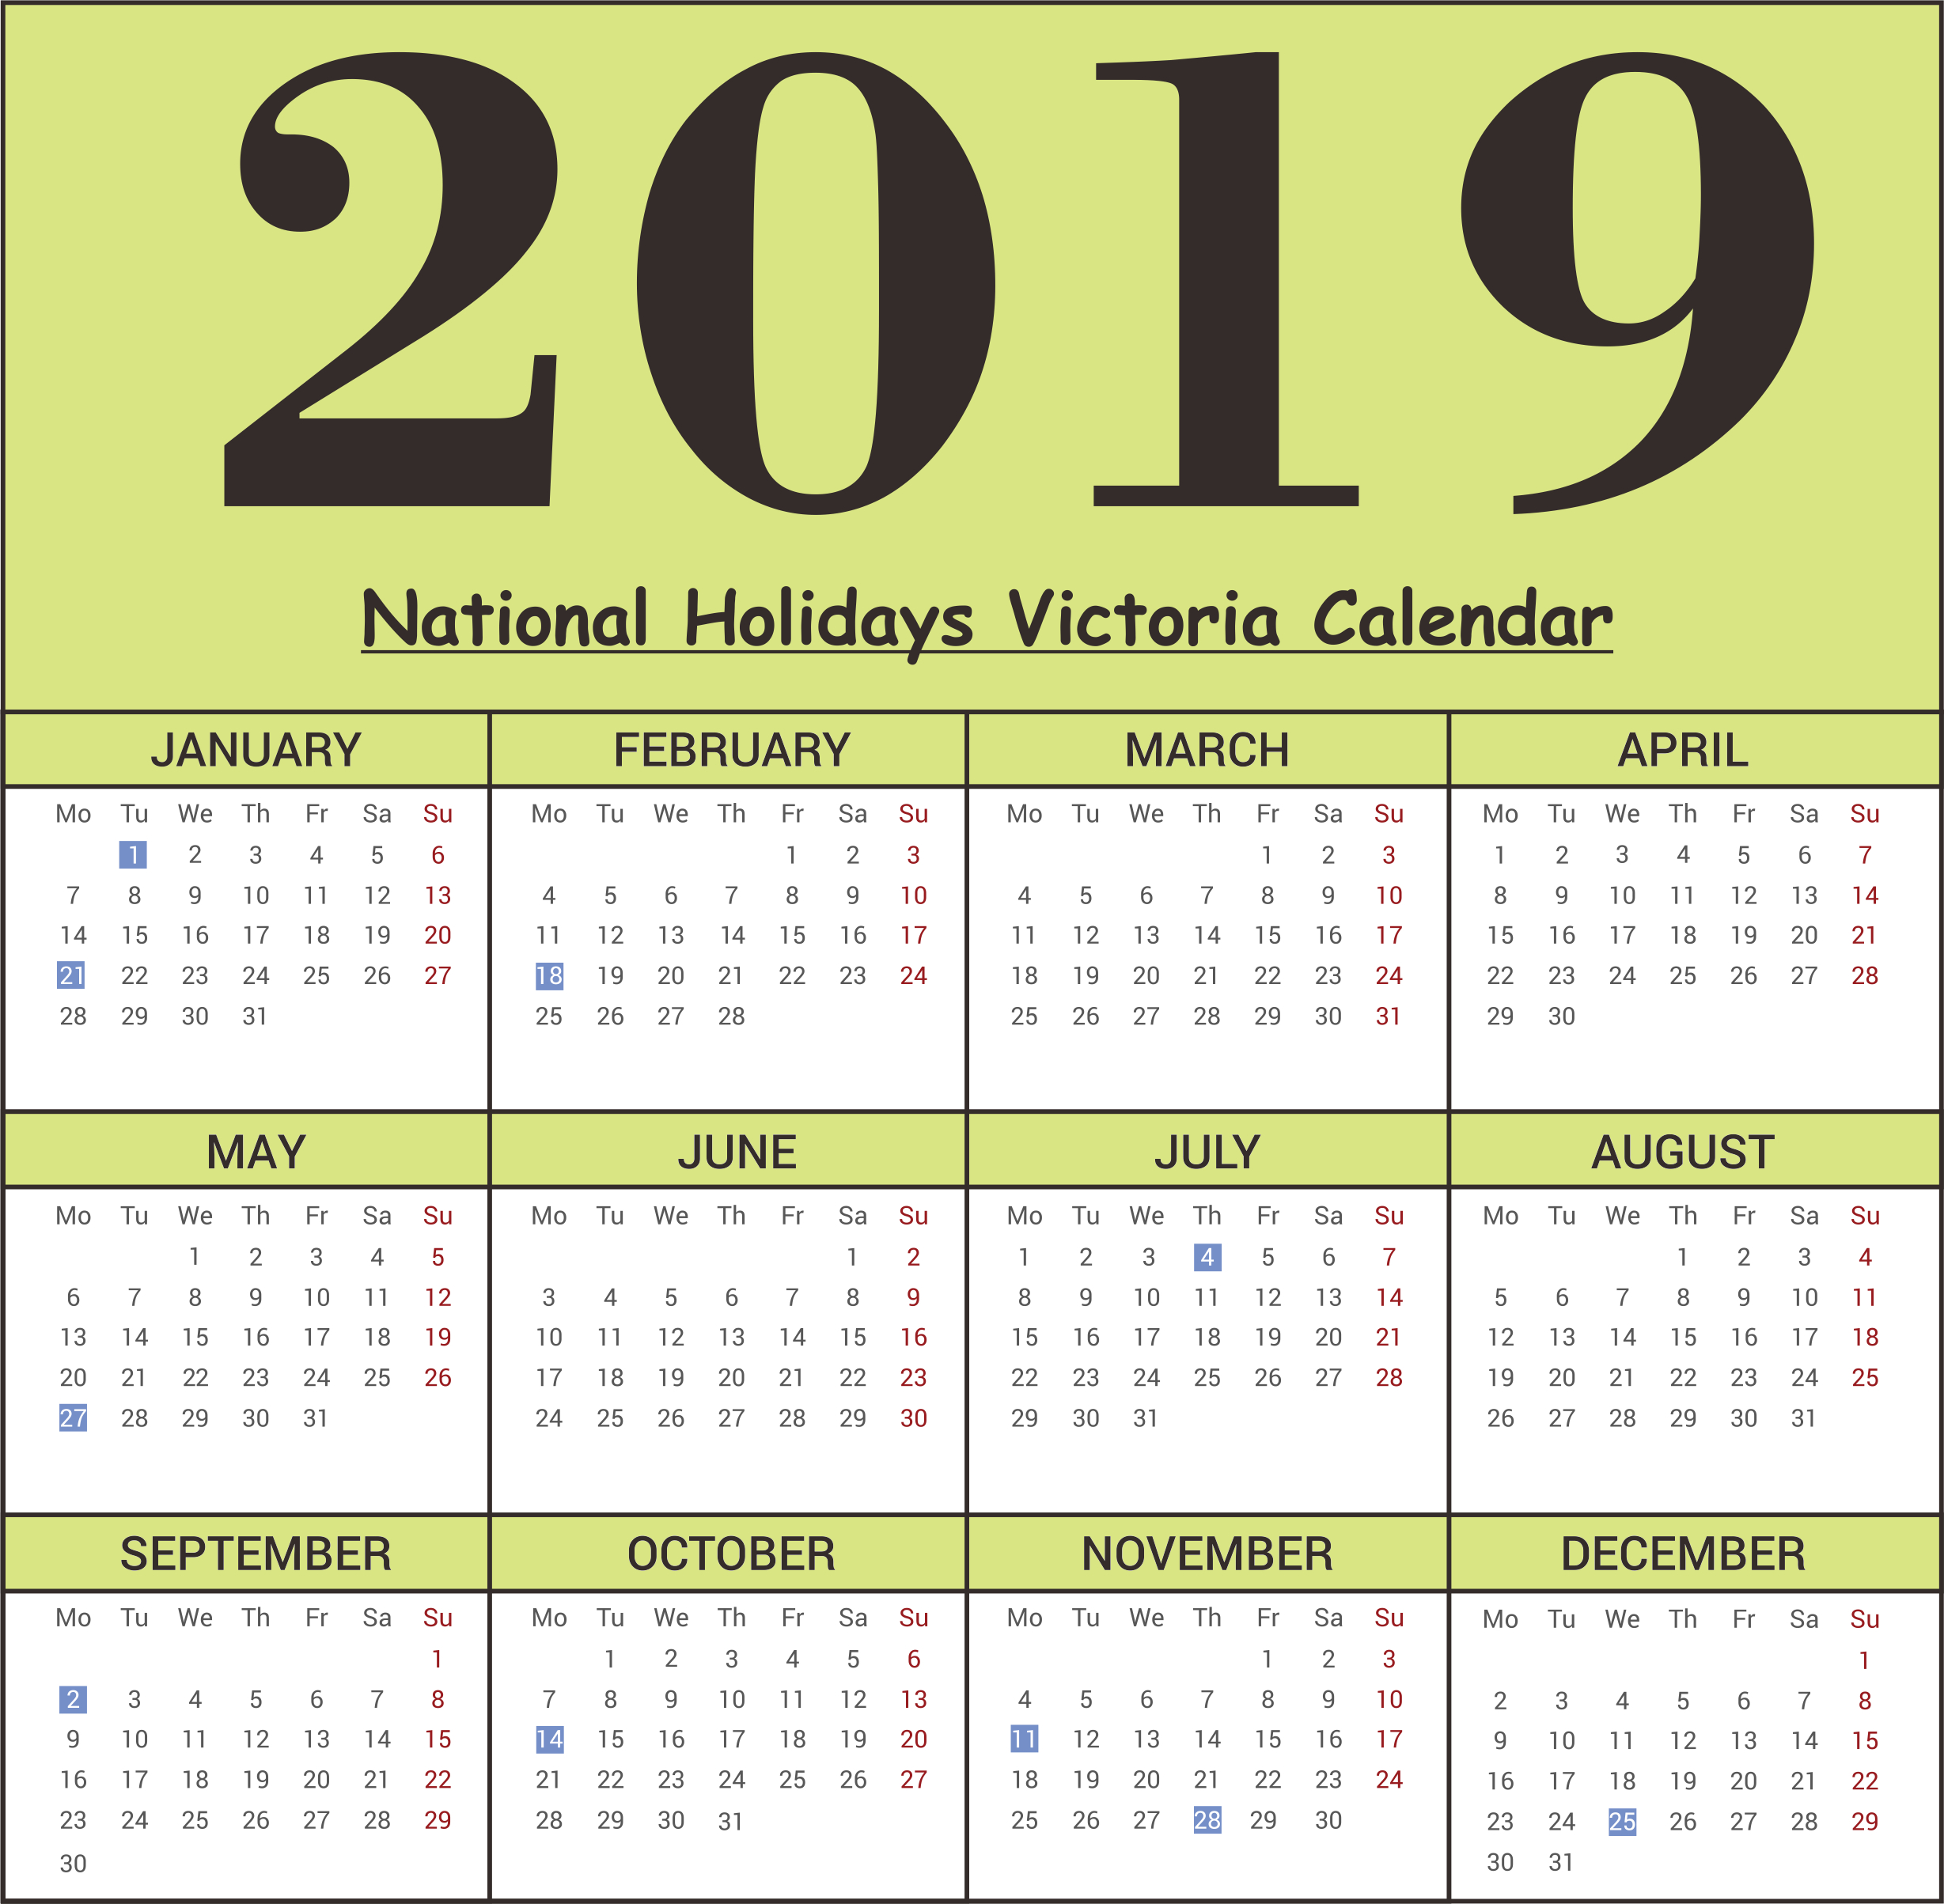 Free Victoria National Holidays 2019 Calendar Templates   Free Calendar 2019 Victoria